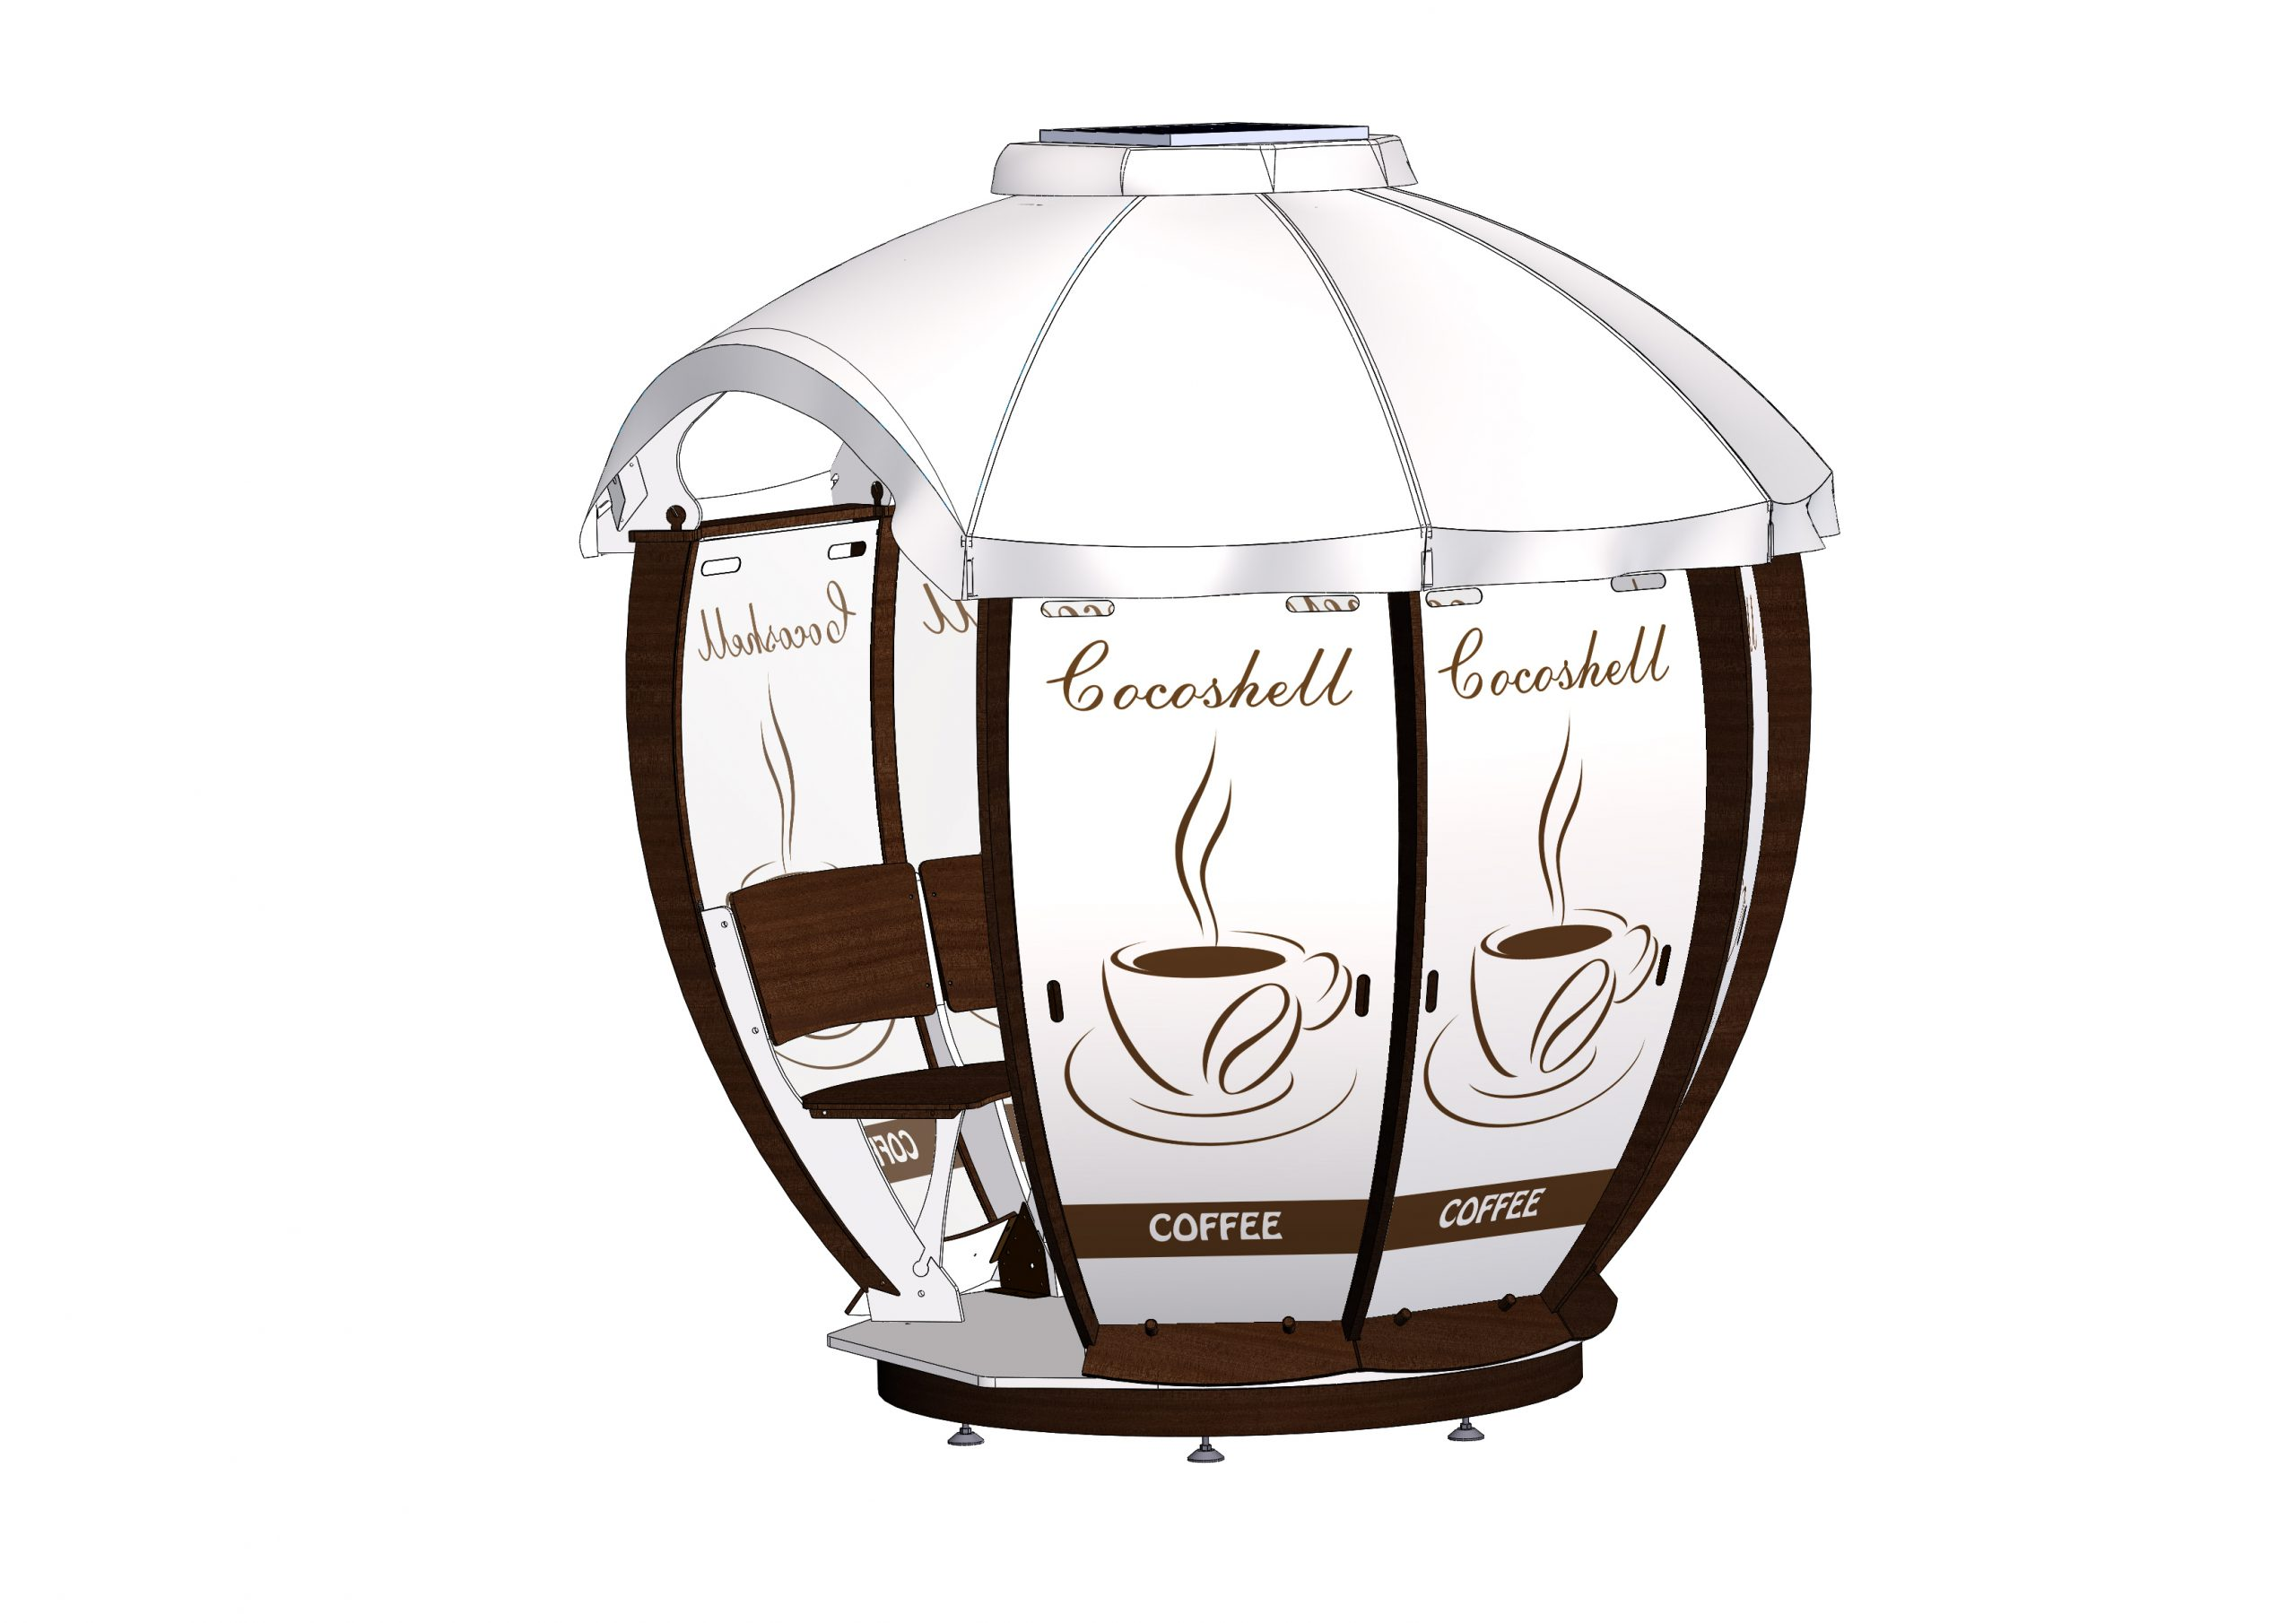 Altanka Cocoshell coffee